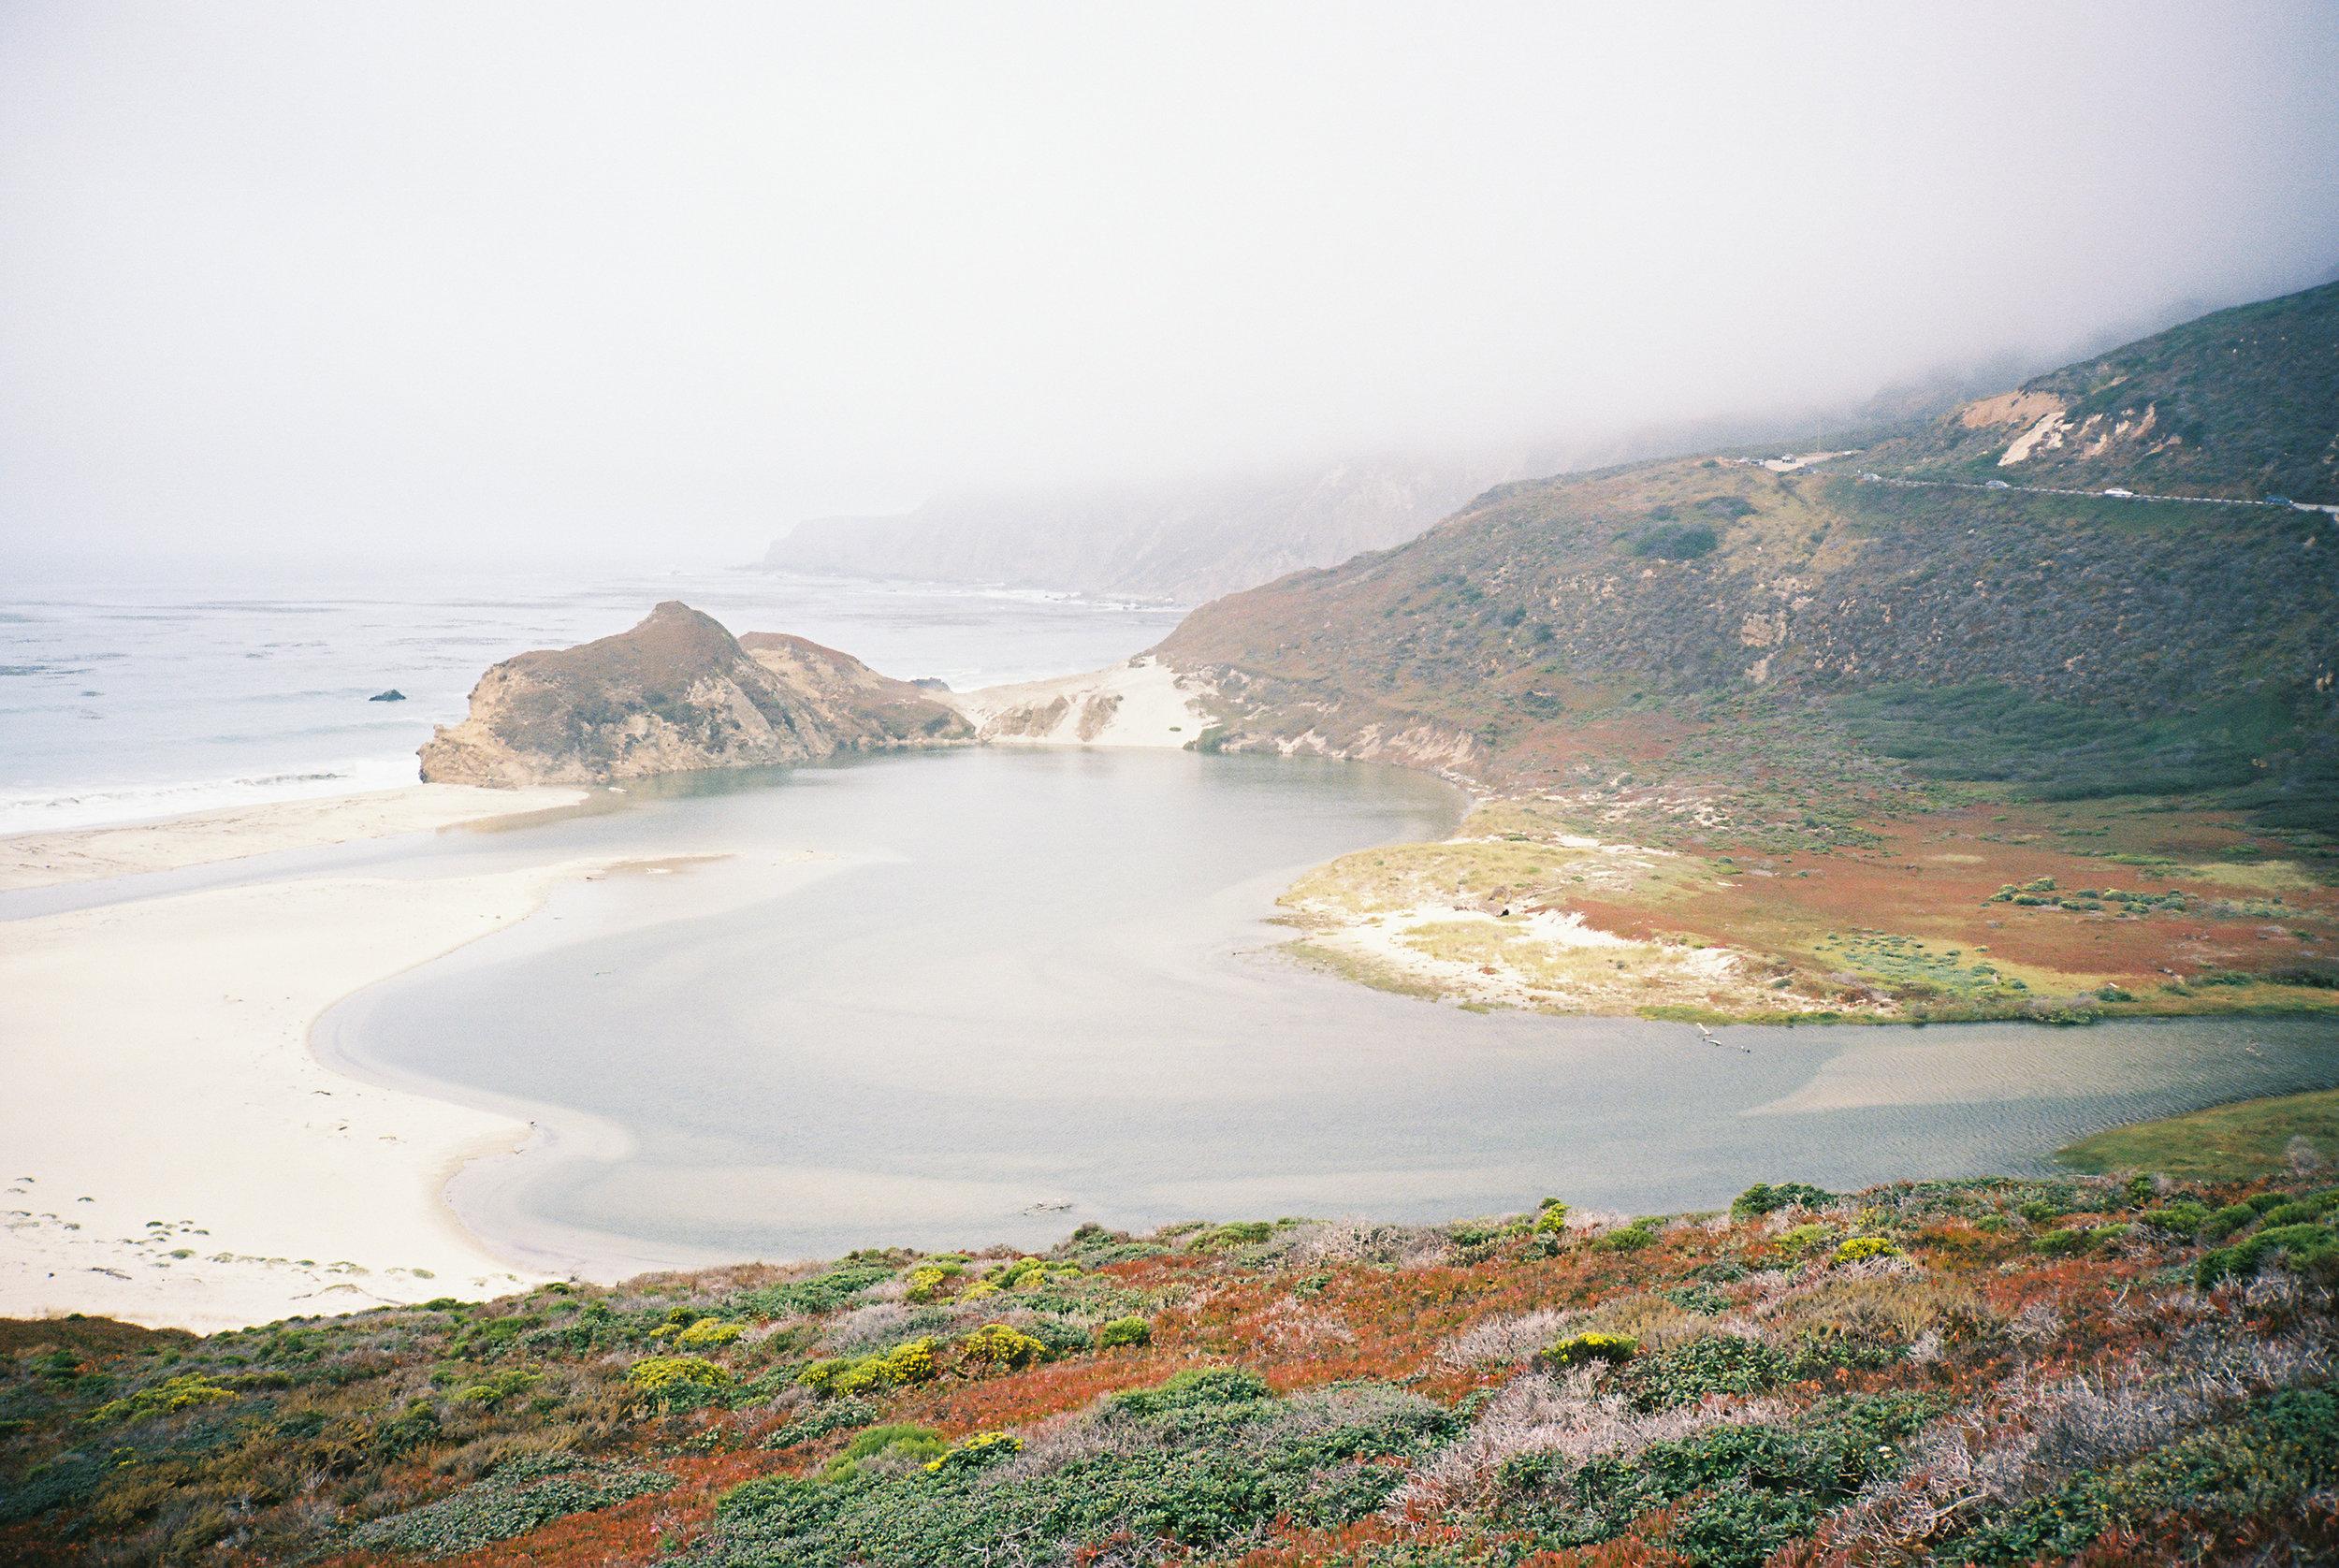 Big Sur, California - Danny